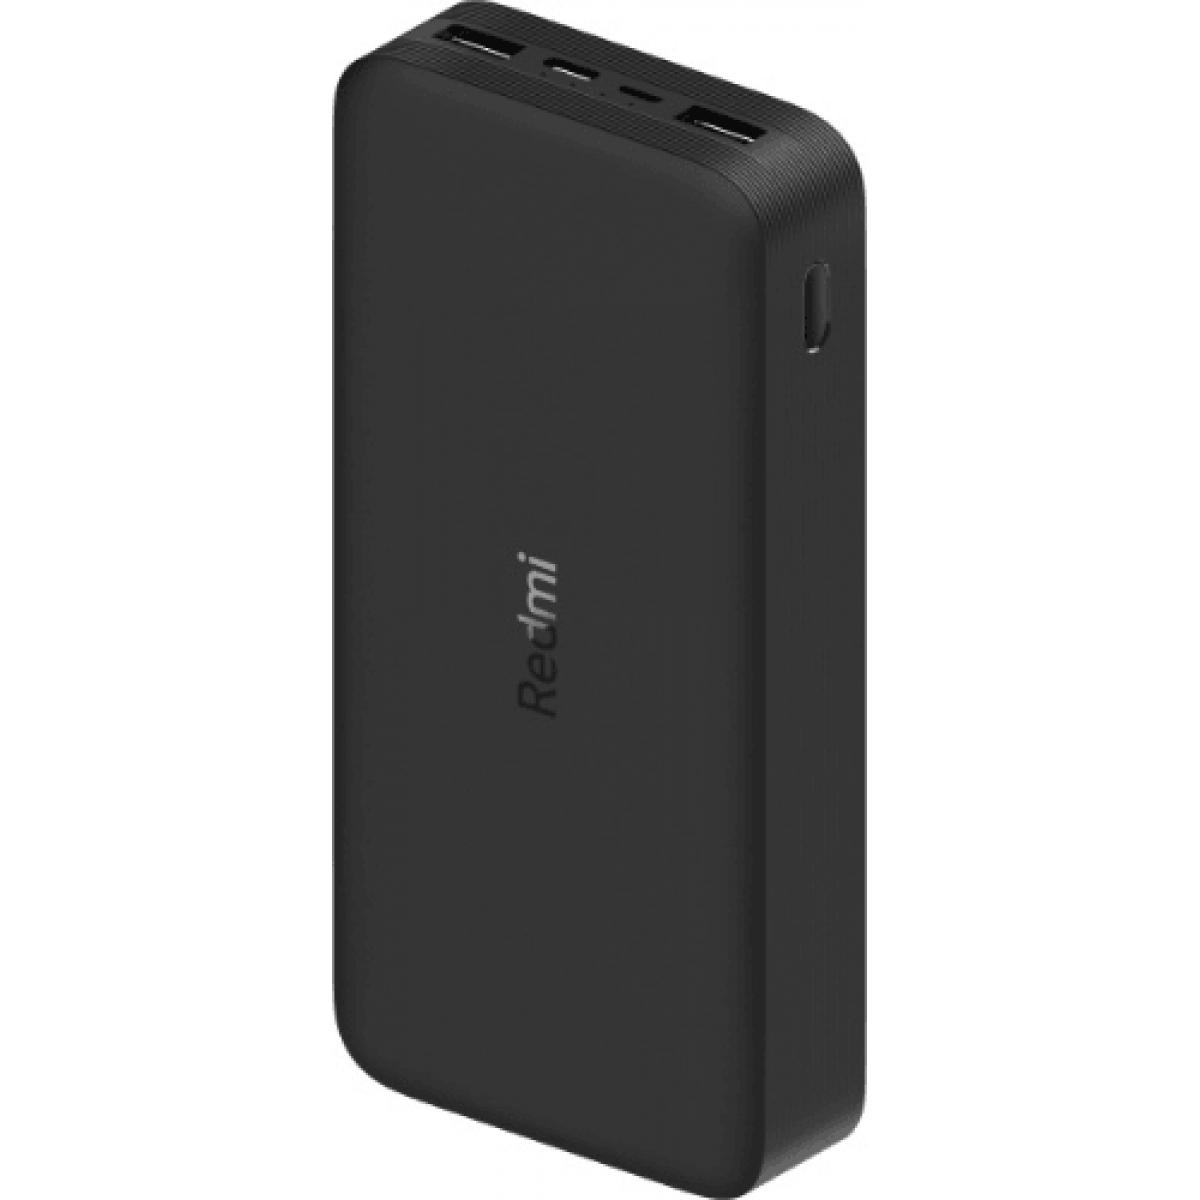 Аккумулятор внешний Xiaomi 20000mAh Redmi 18W Fast Charge Power Bank Black